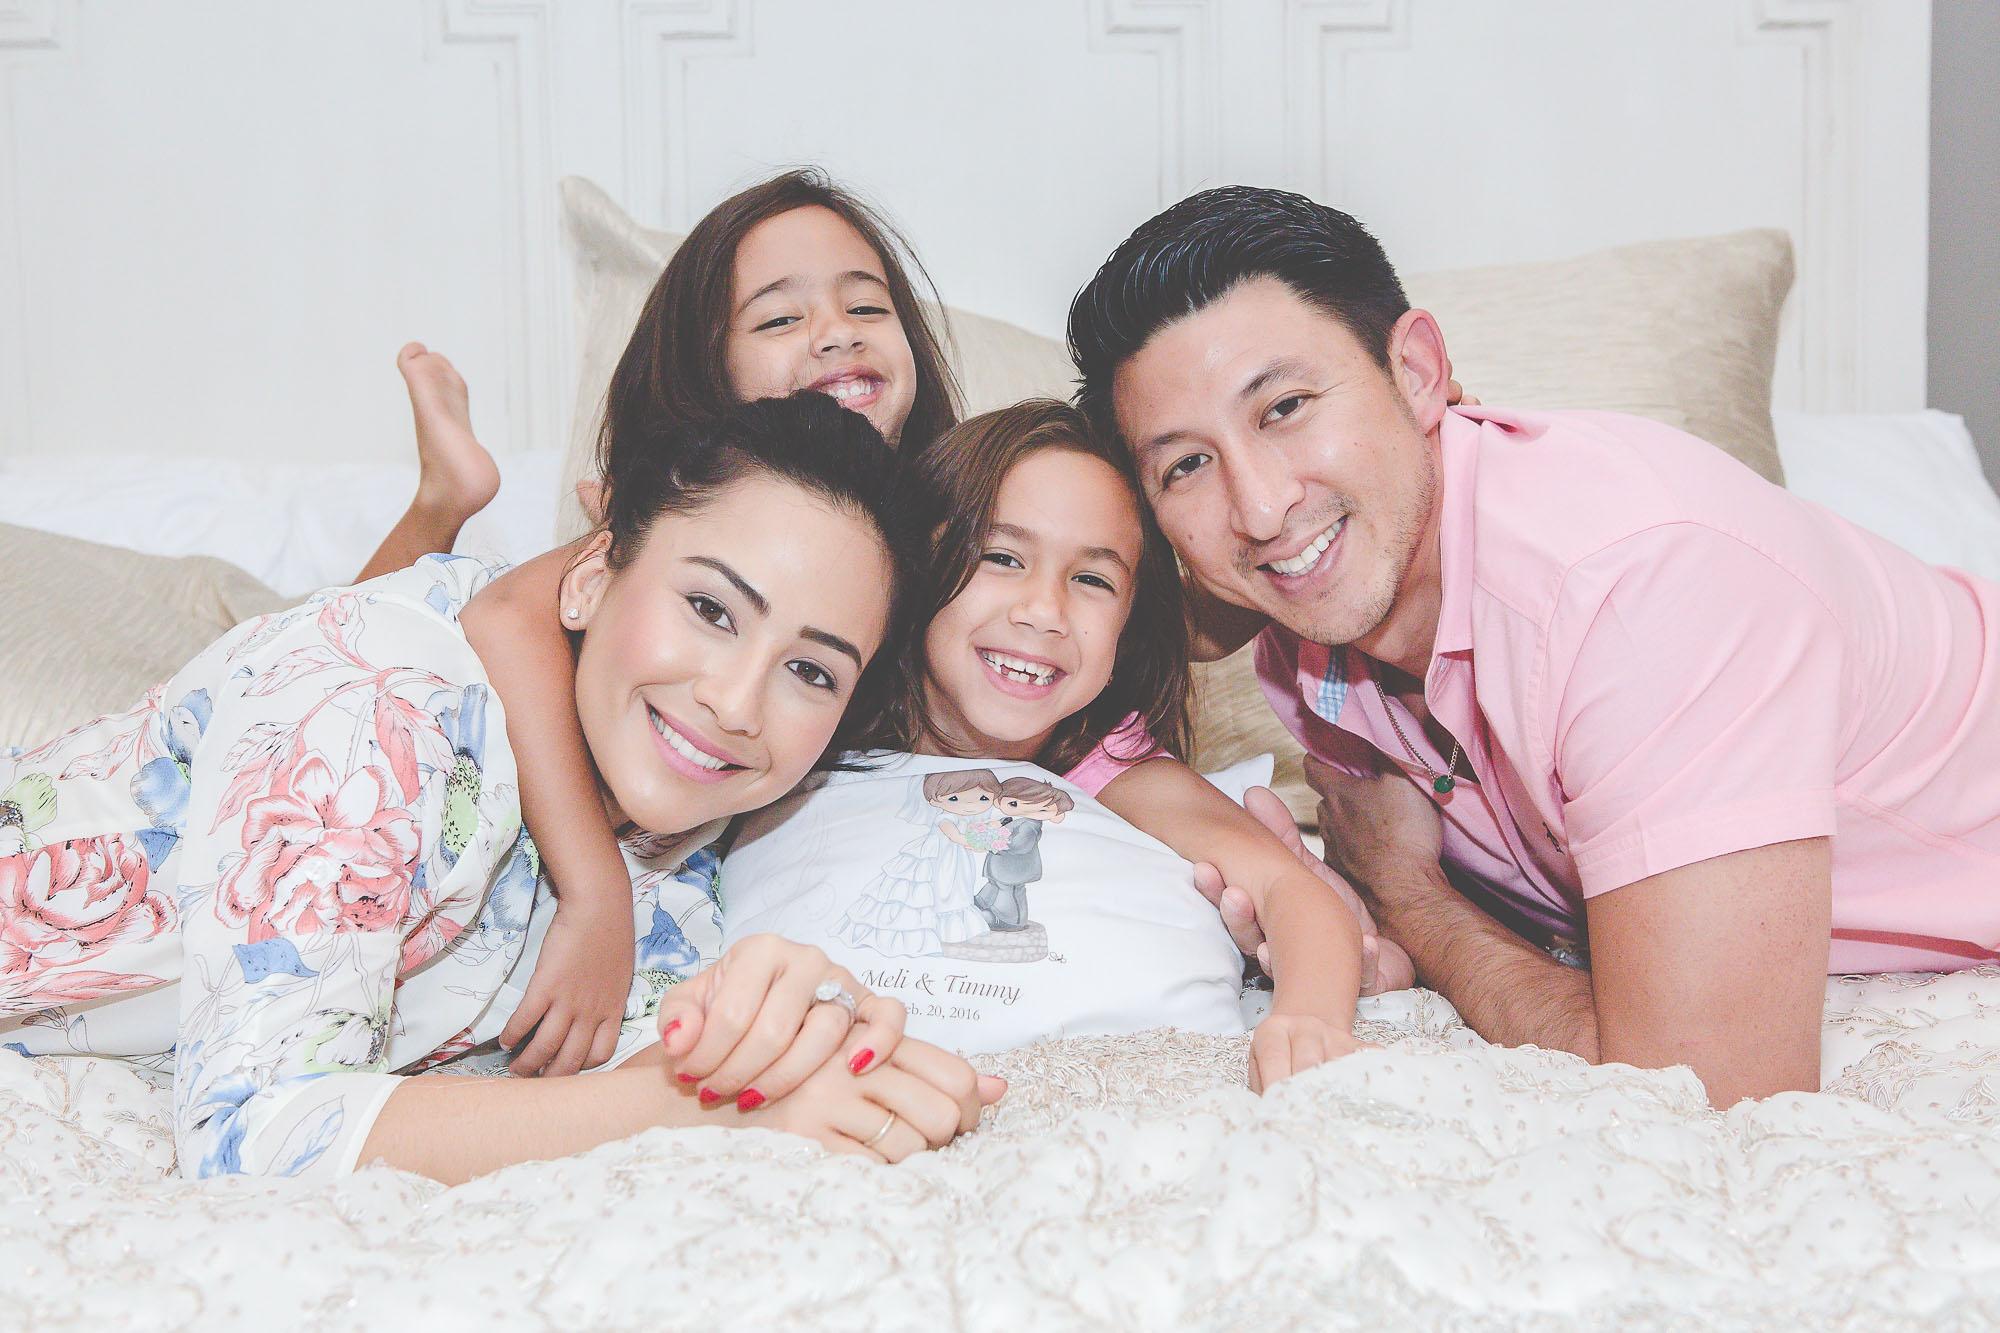 The Chen Family: Family Photo Shoot in Davie, Fl